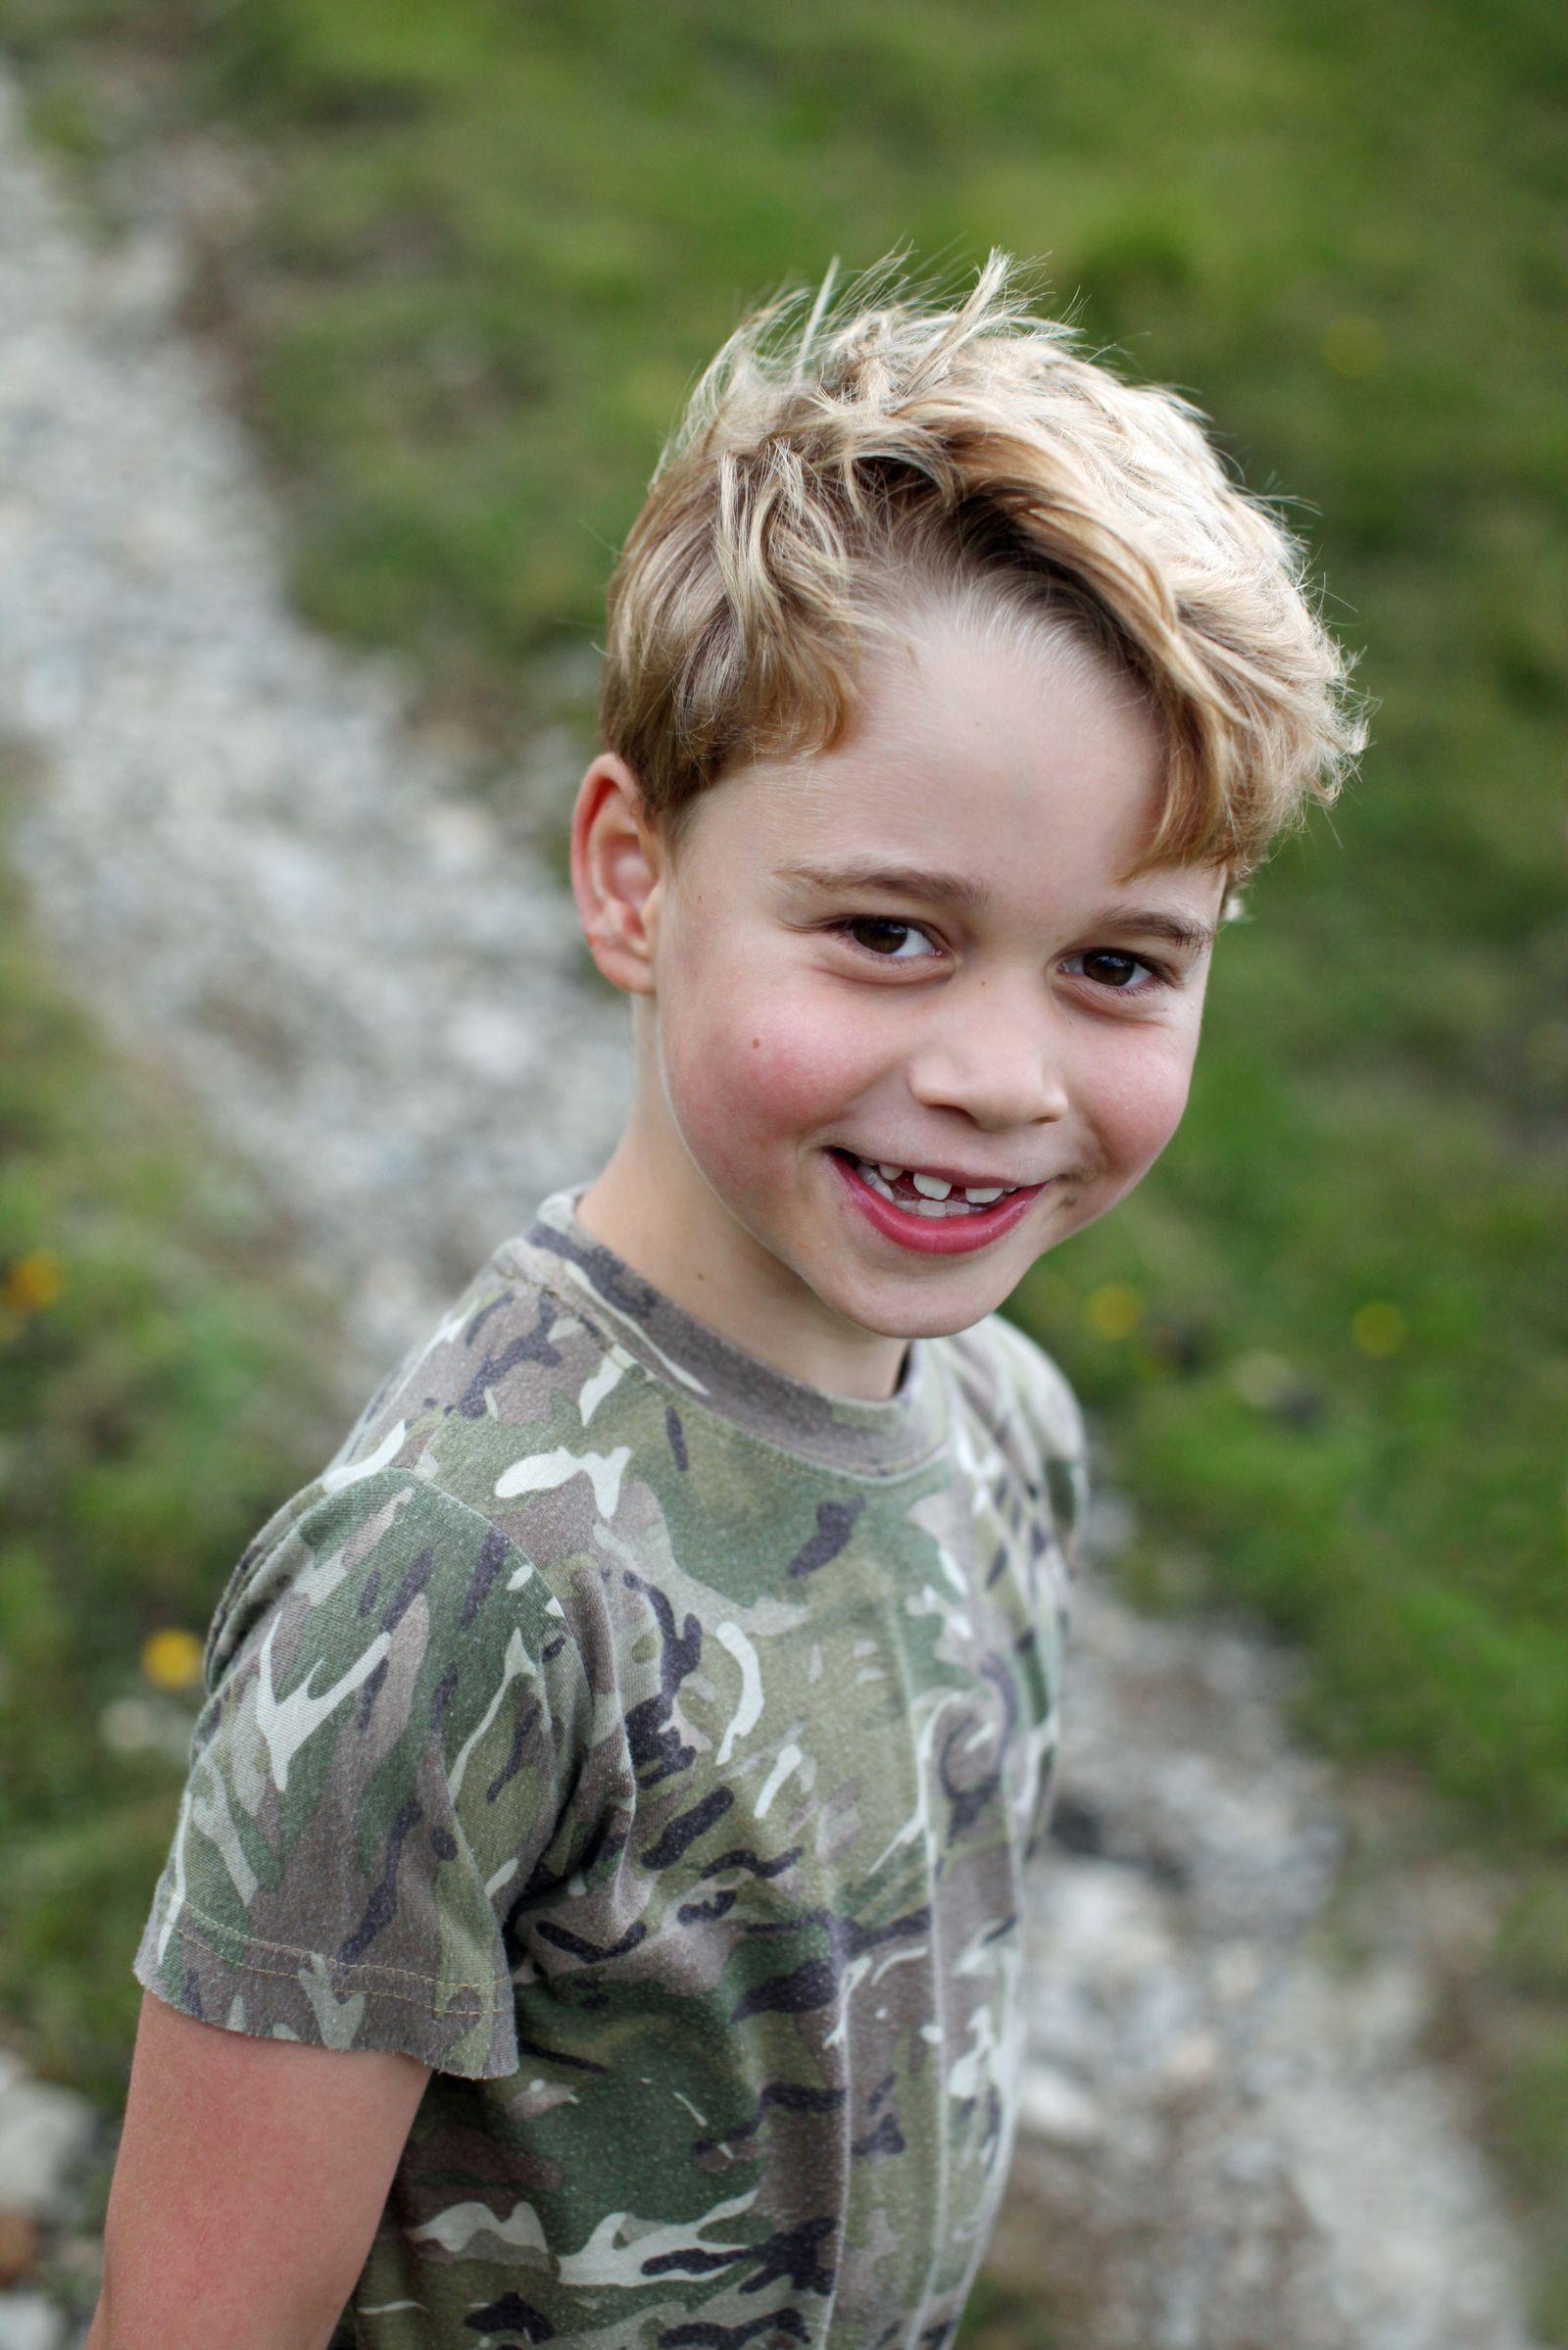 Prince George Of Cambridge Turns 7